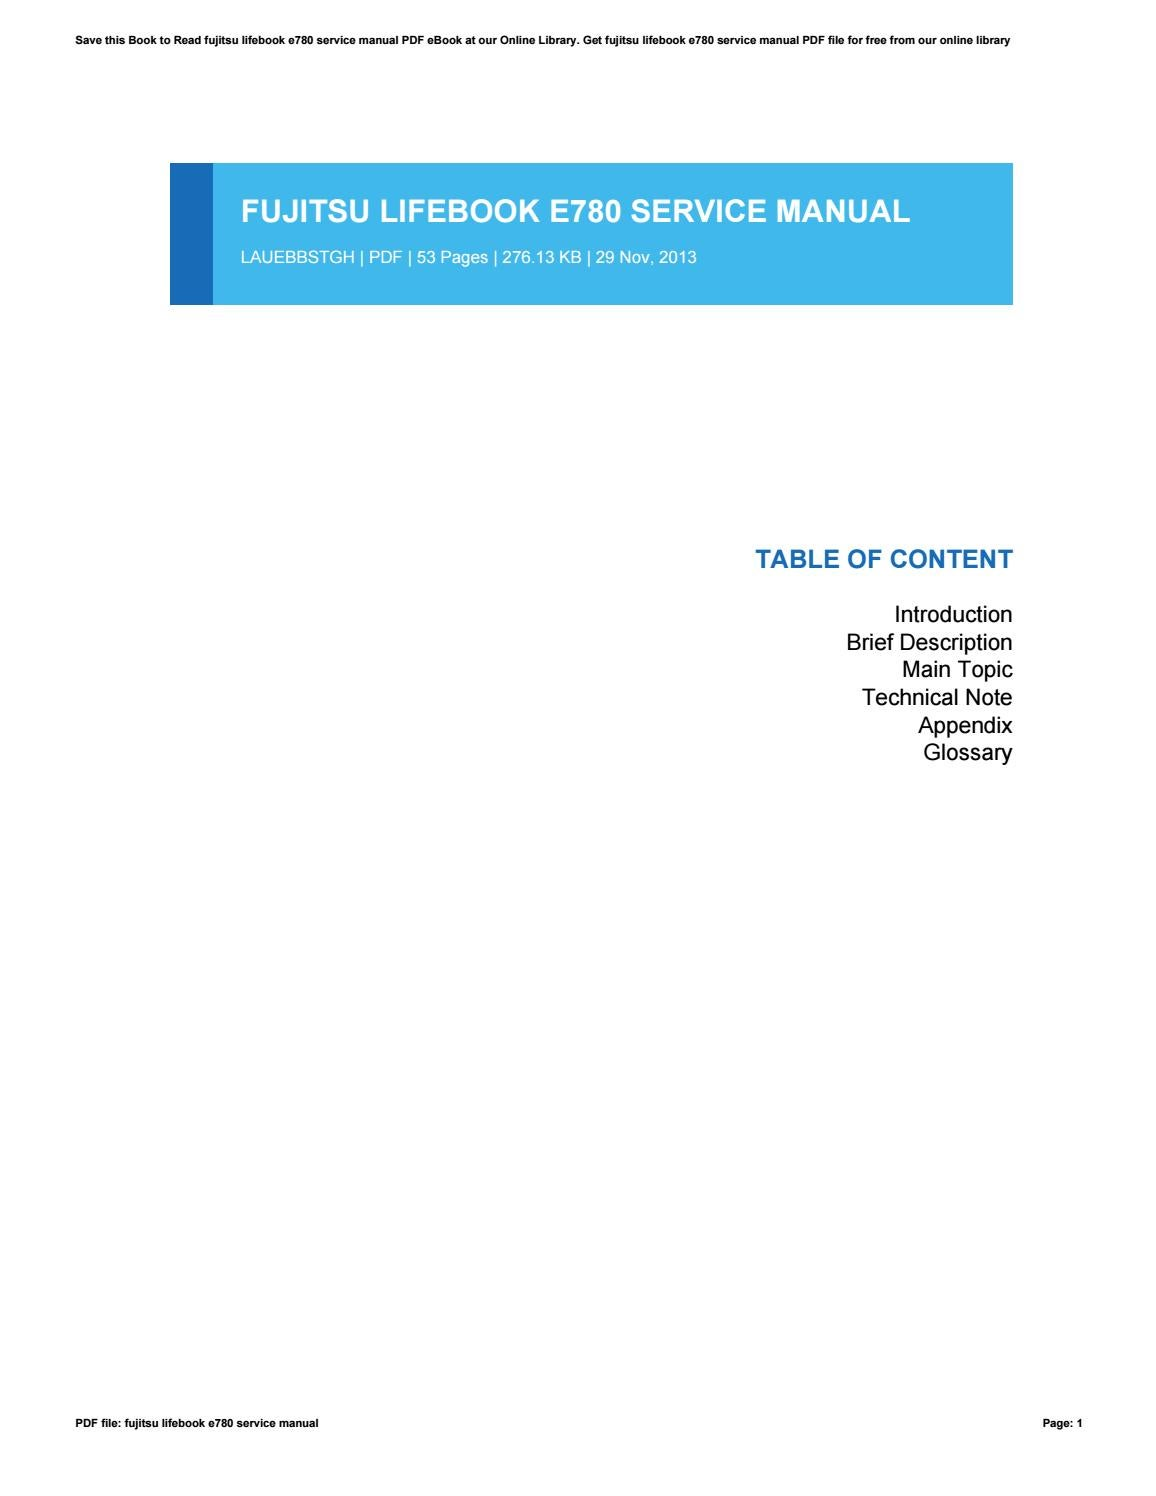 fujitsu lifebook e780 service manual by garyschroeder3582 issuu rh issuu com fujitsu lifebook uh572 service manual fujitsu lifebook u772 service manual